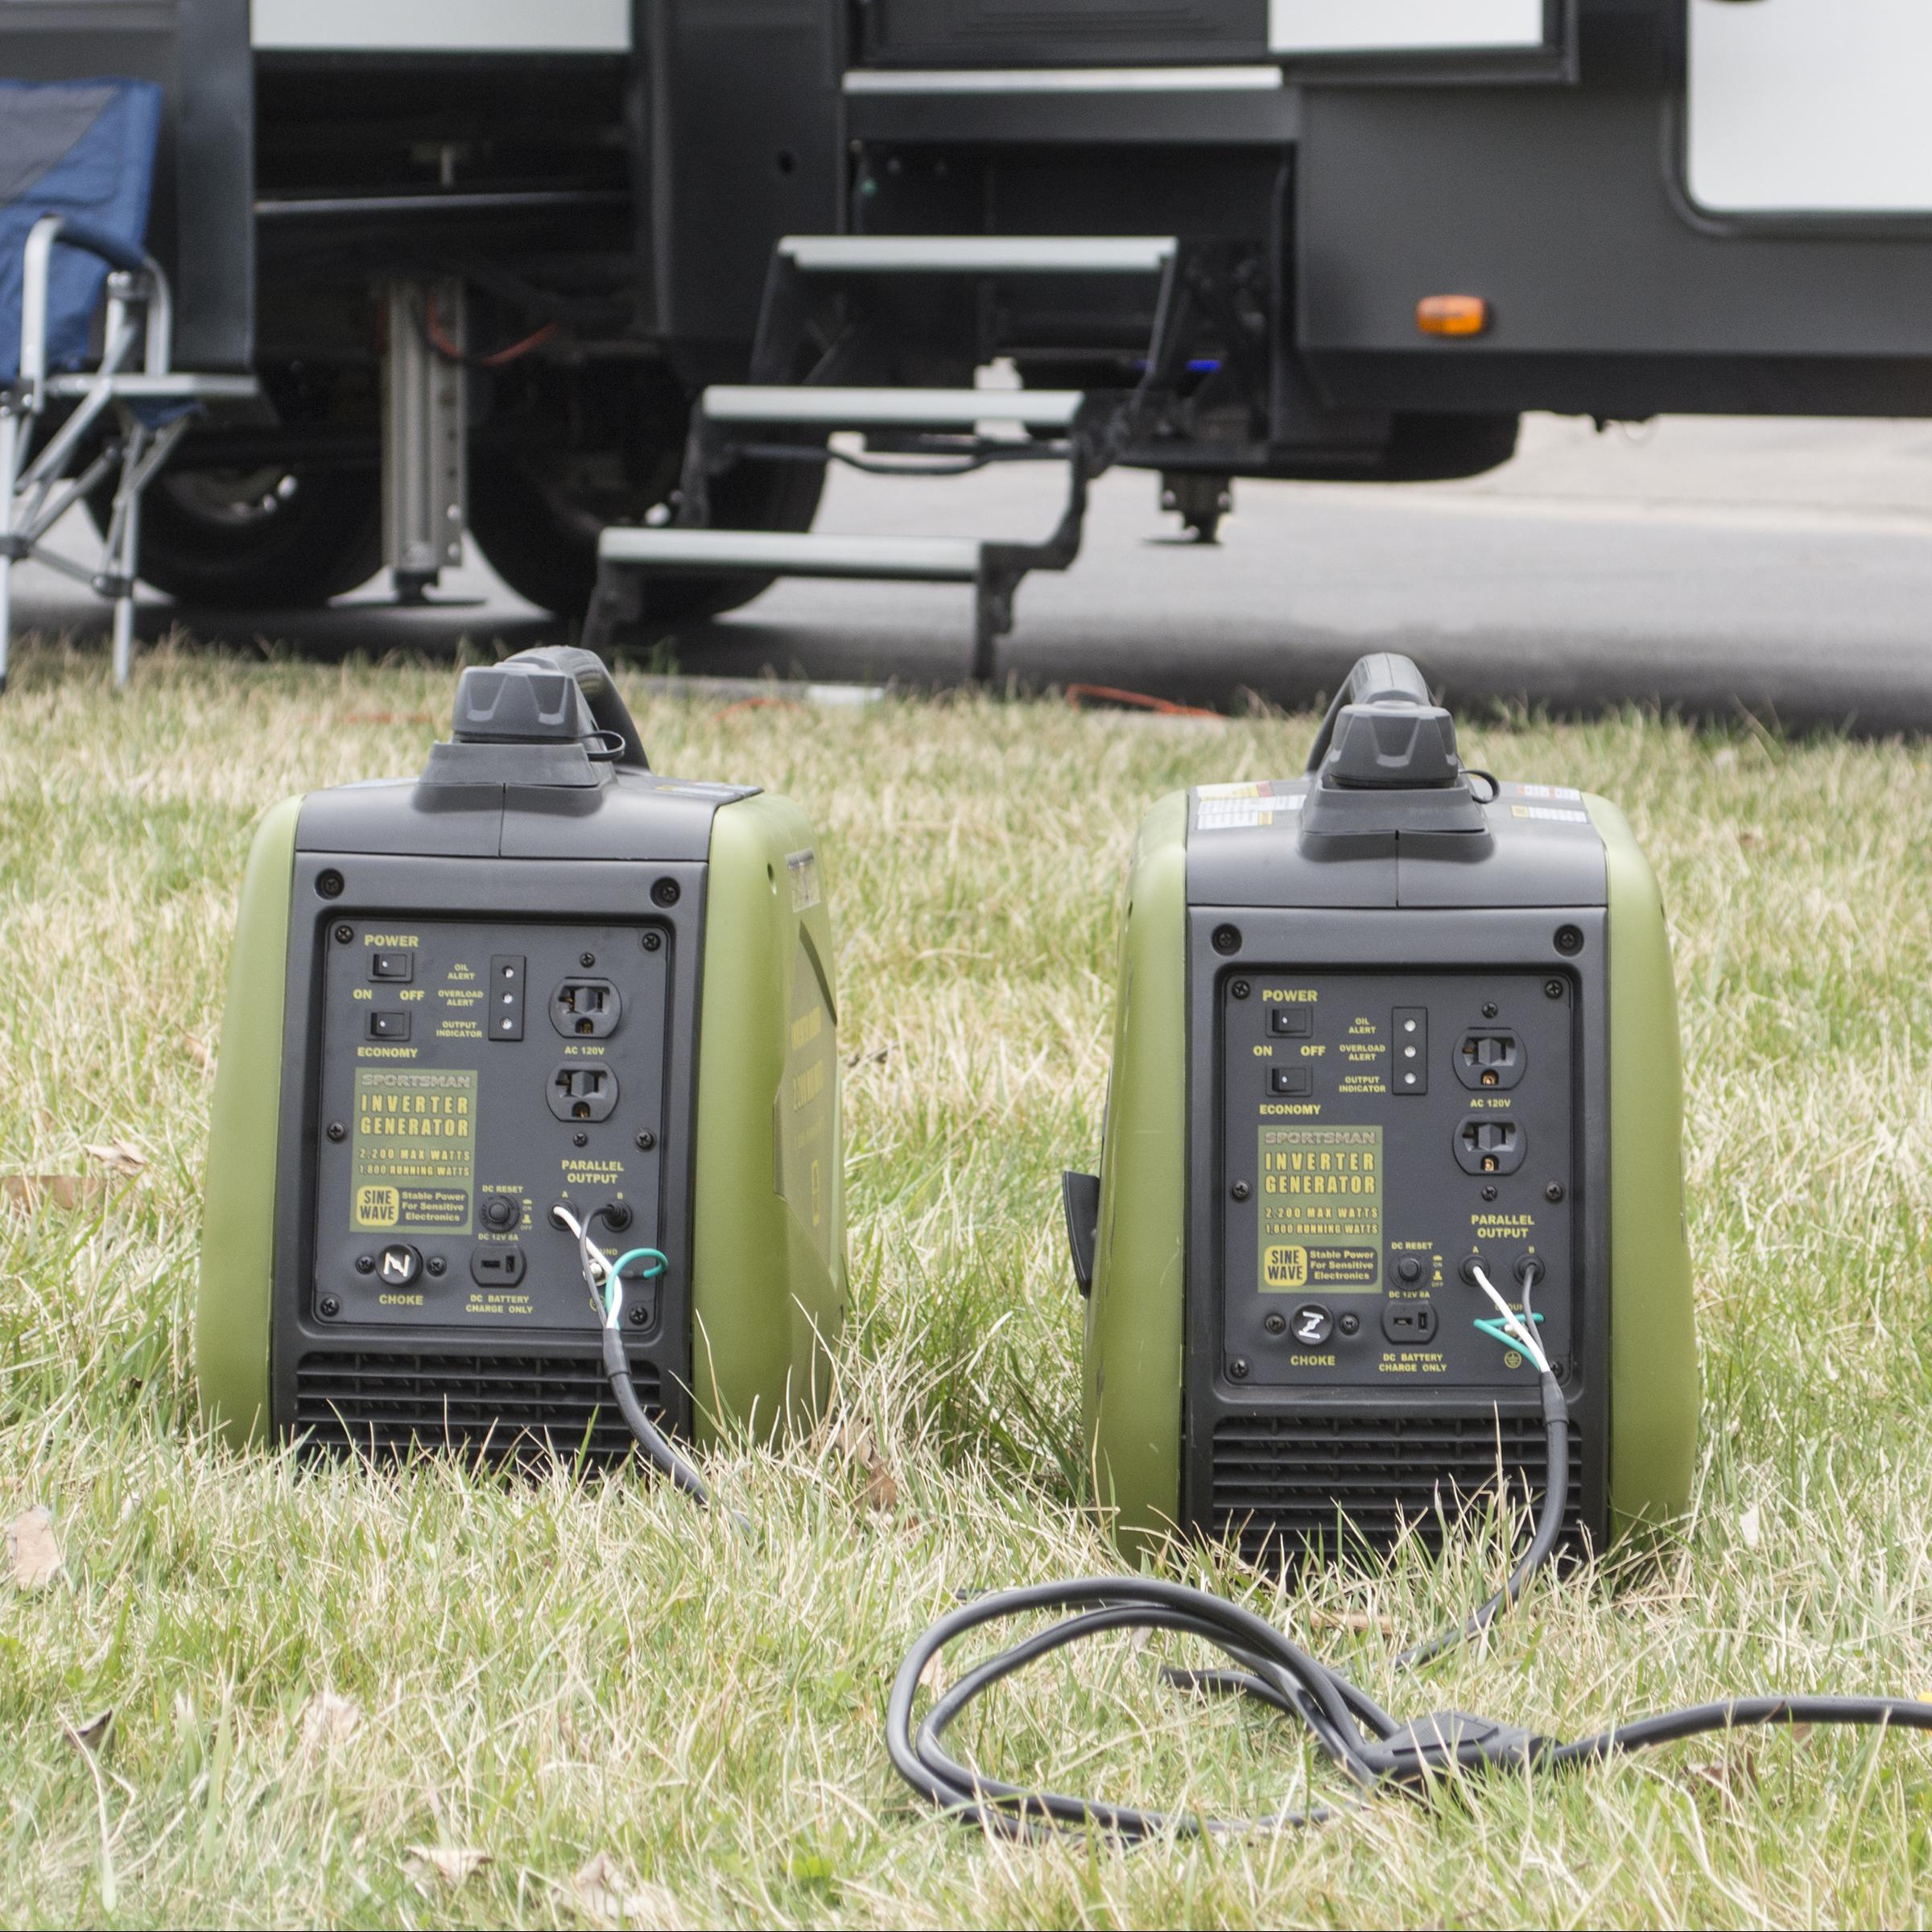 Sportsman 4400 Watt Gasoline Portable Inverter Generator Kit with 30 Amp Parallel Cable